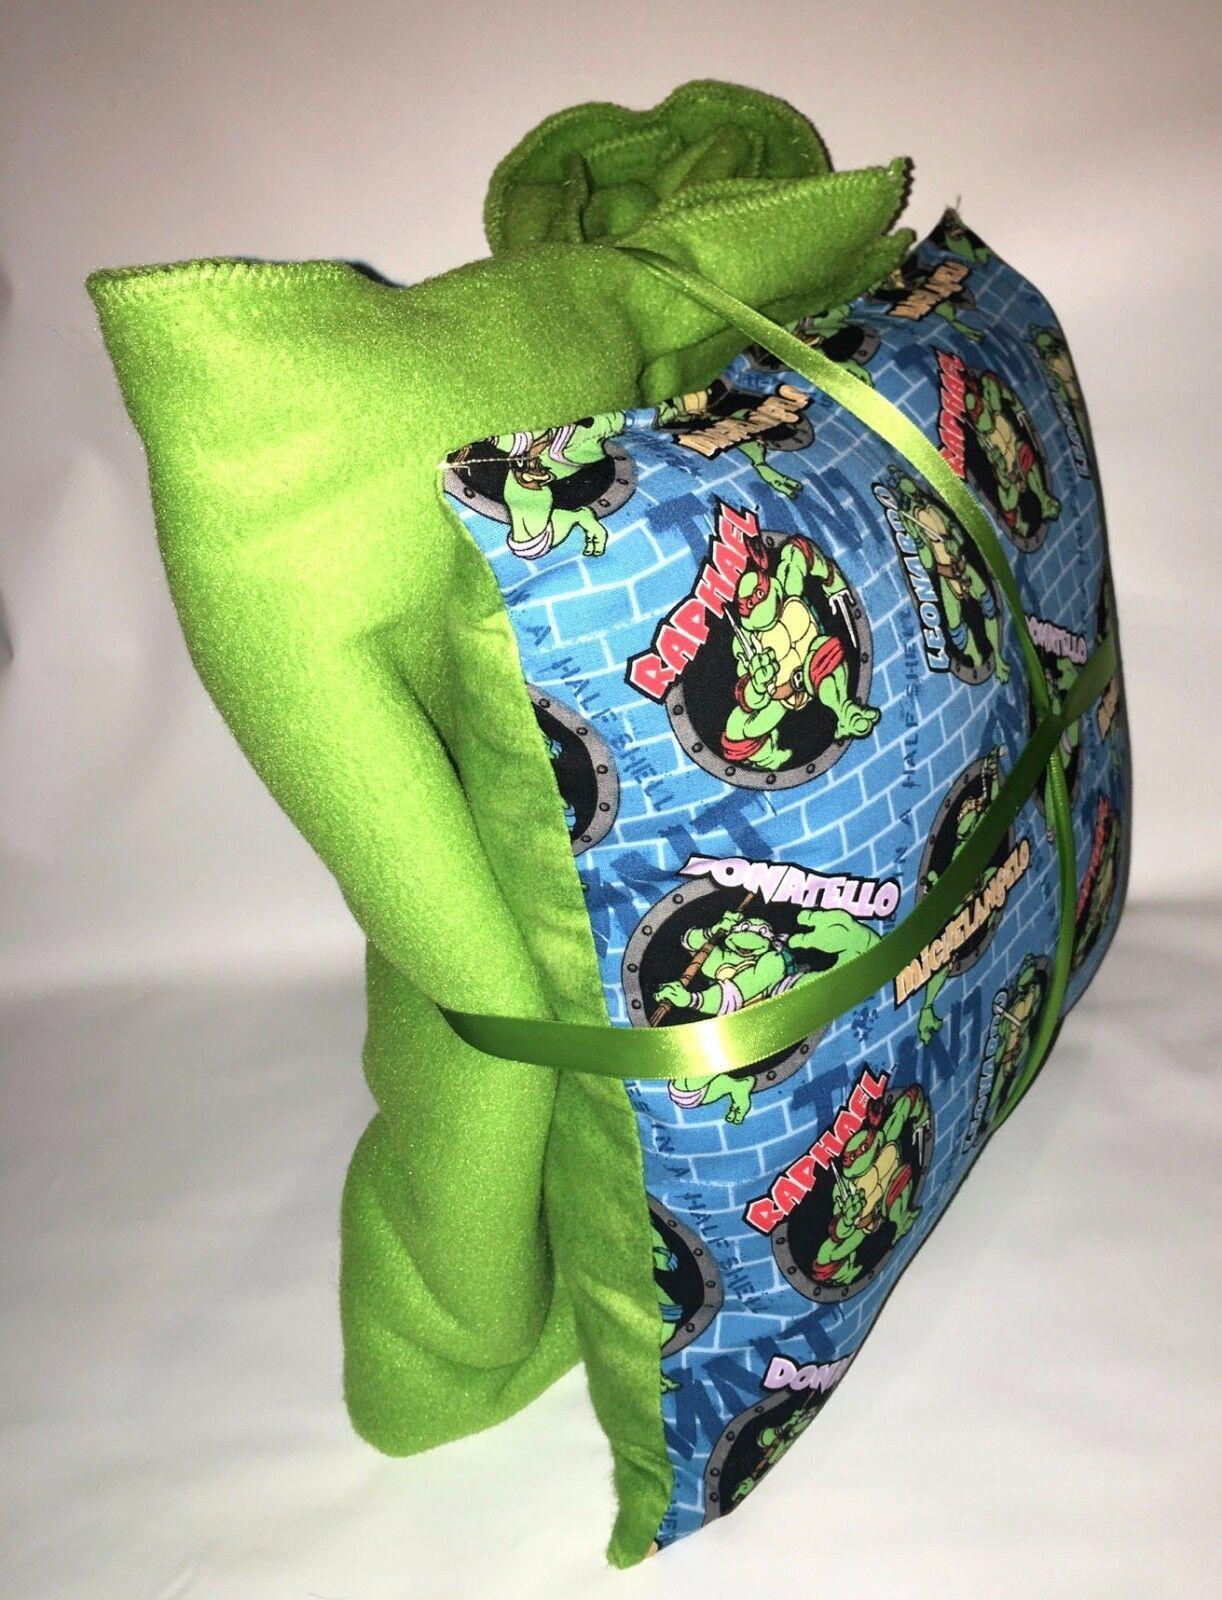 TMNT Pillow And Blanket Teenage Mutant Ninja Turtle Wall Pillow and Blanket Set image 2